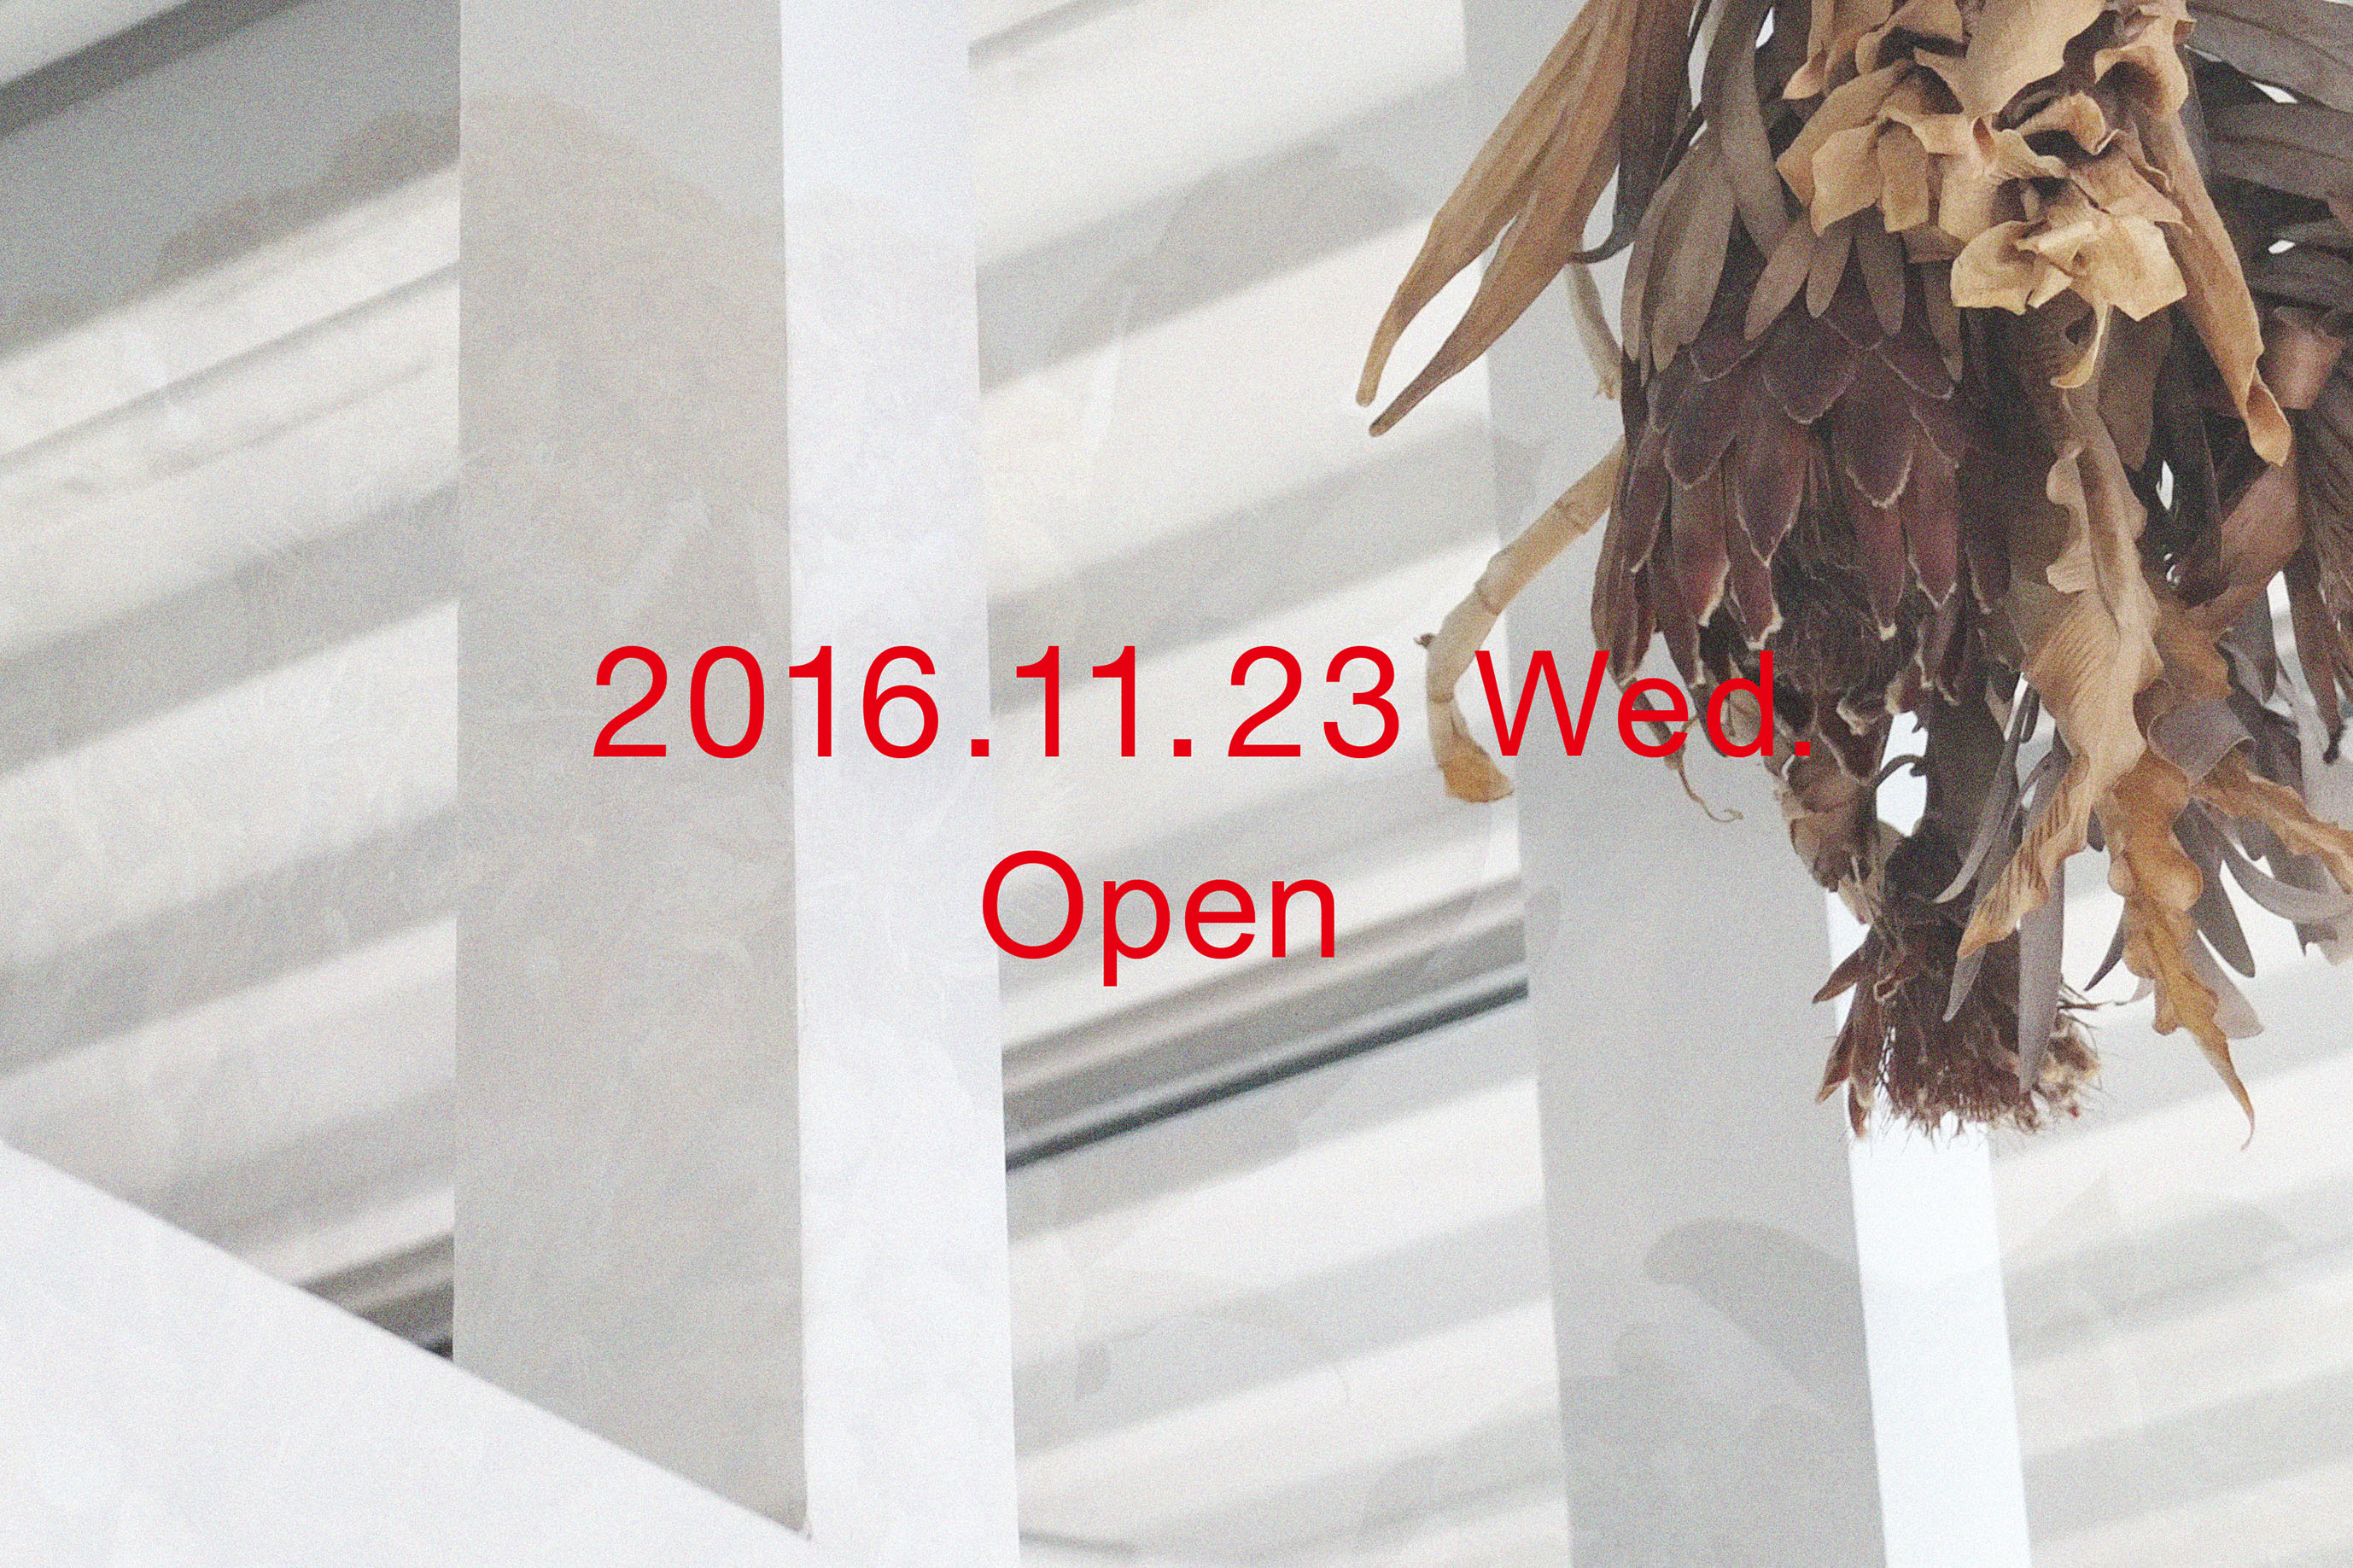 ss-open_20161123